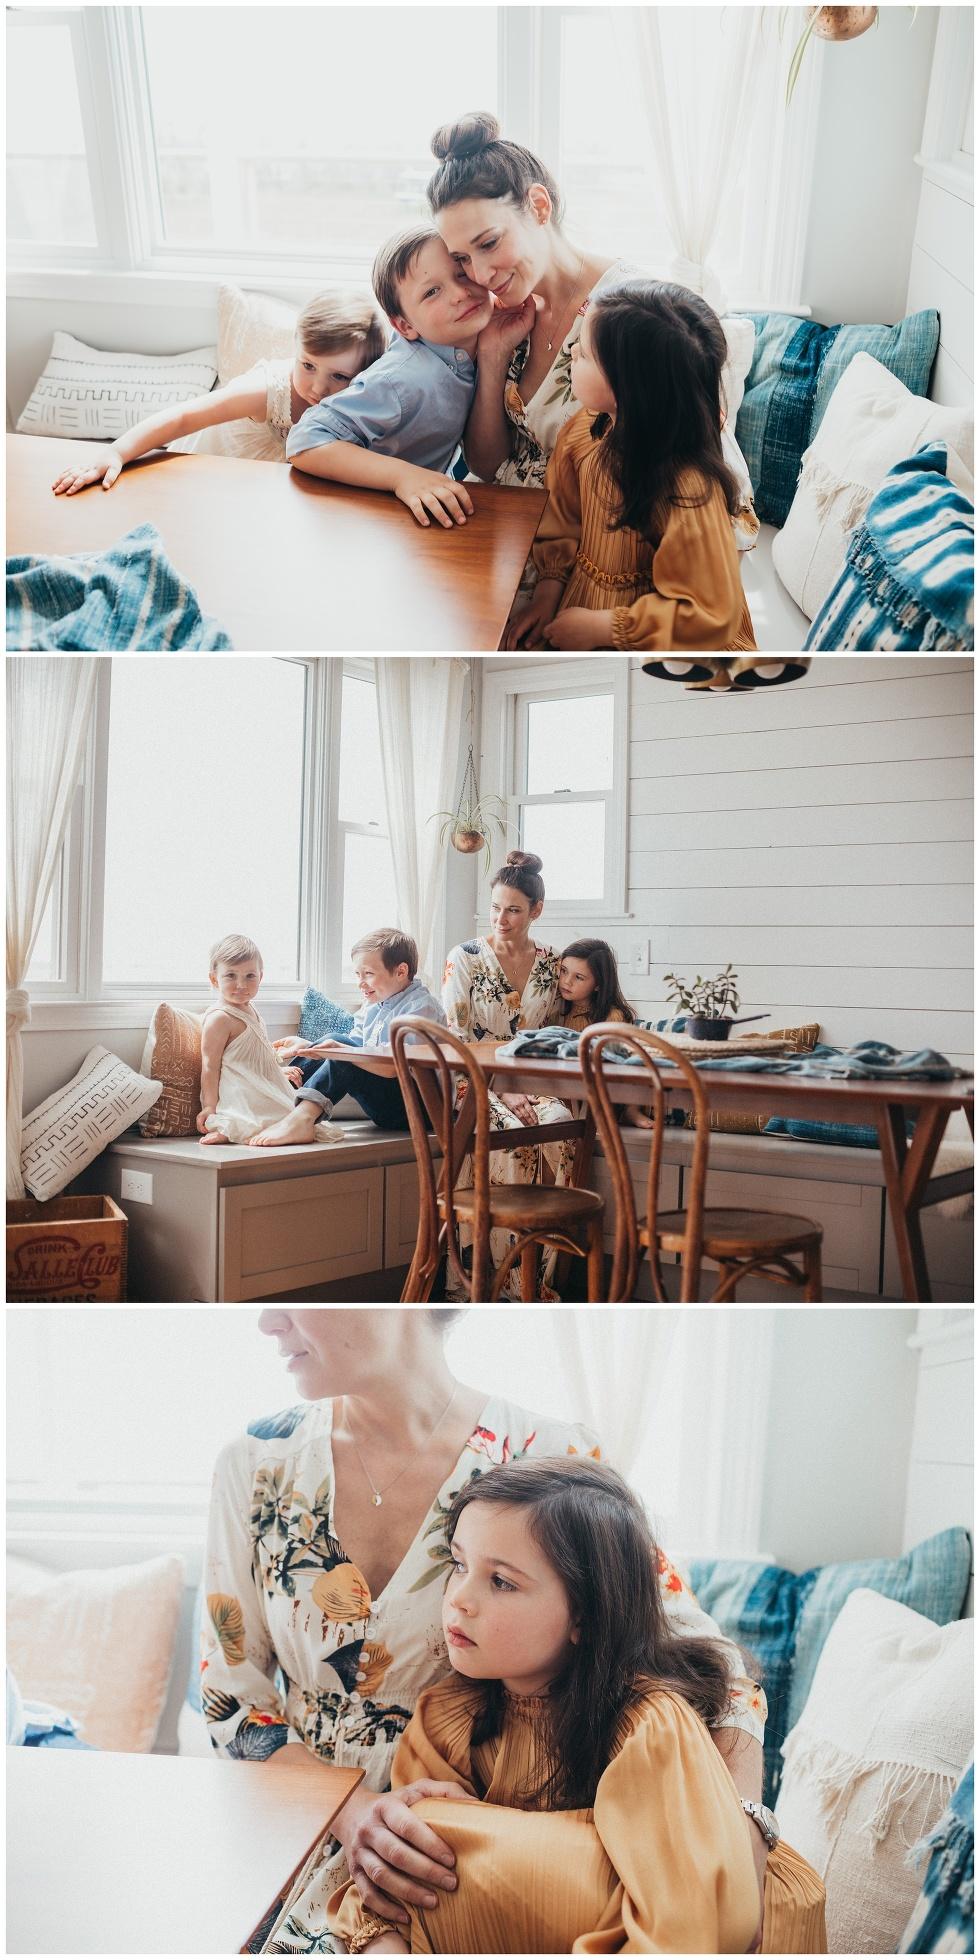 MA motherhood photographer portraits